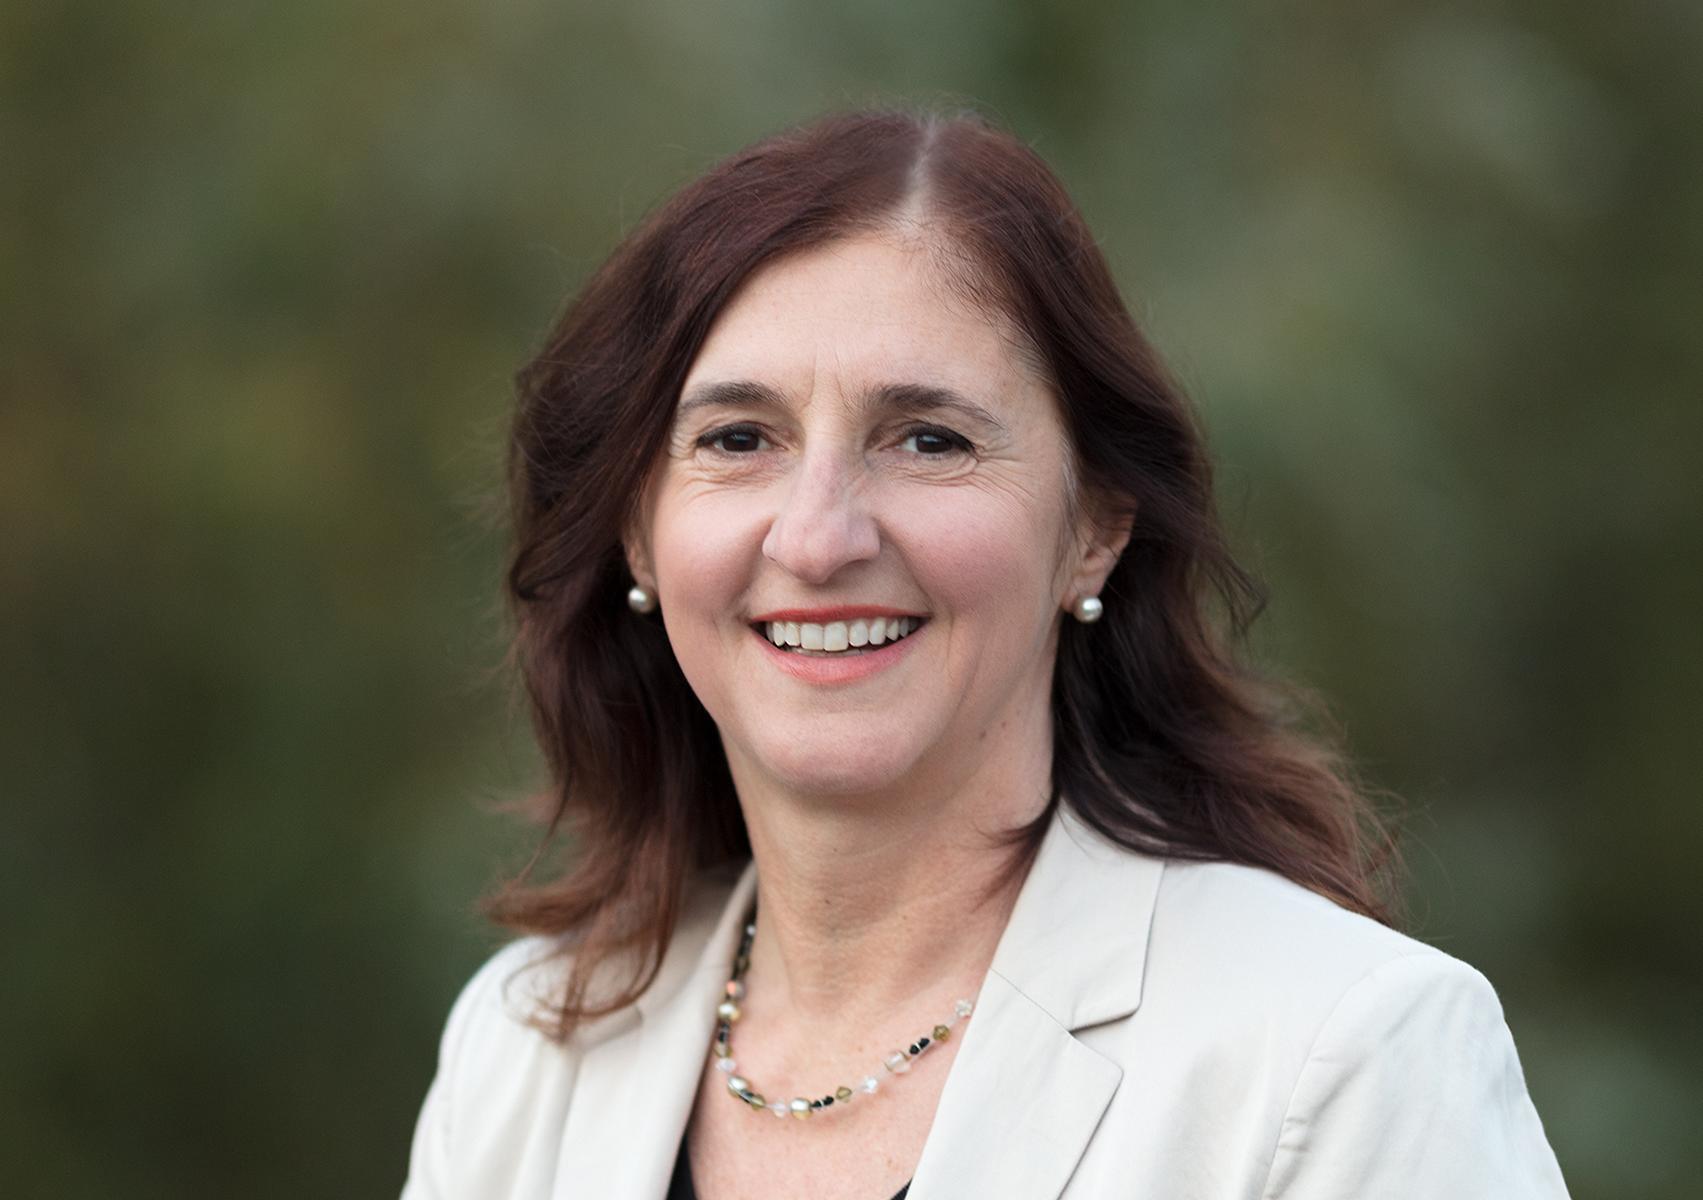 Mihaela Stickel-Langsdorf